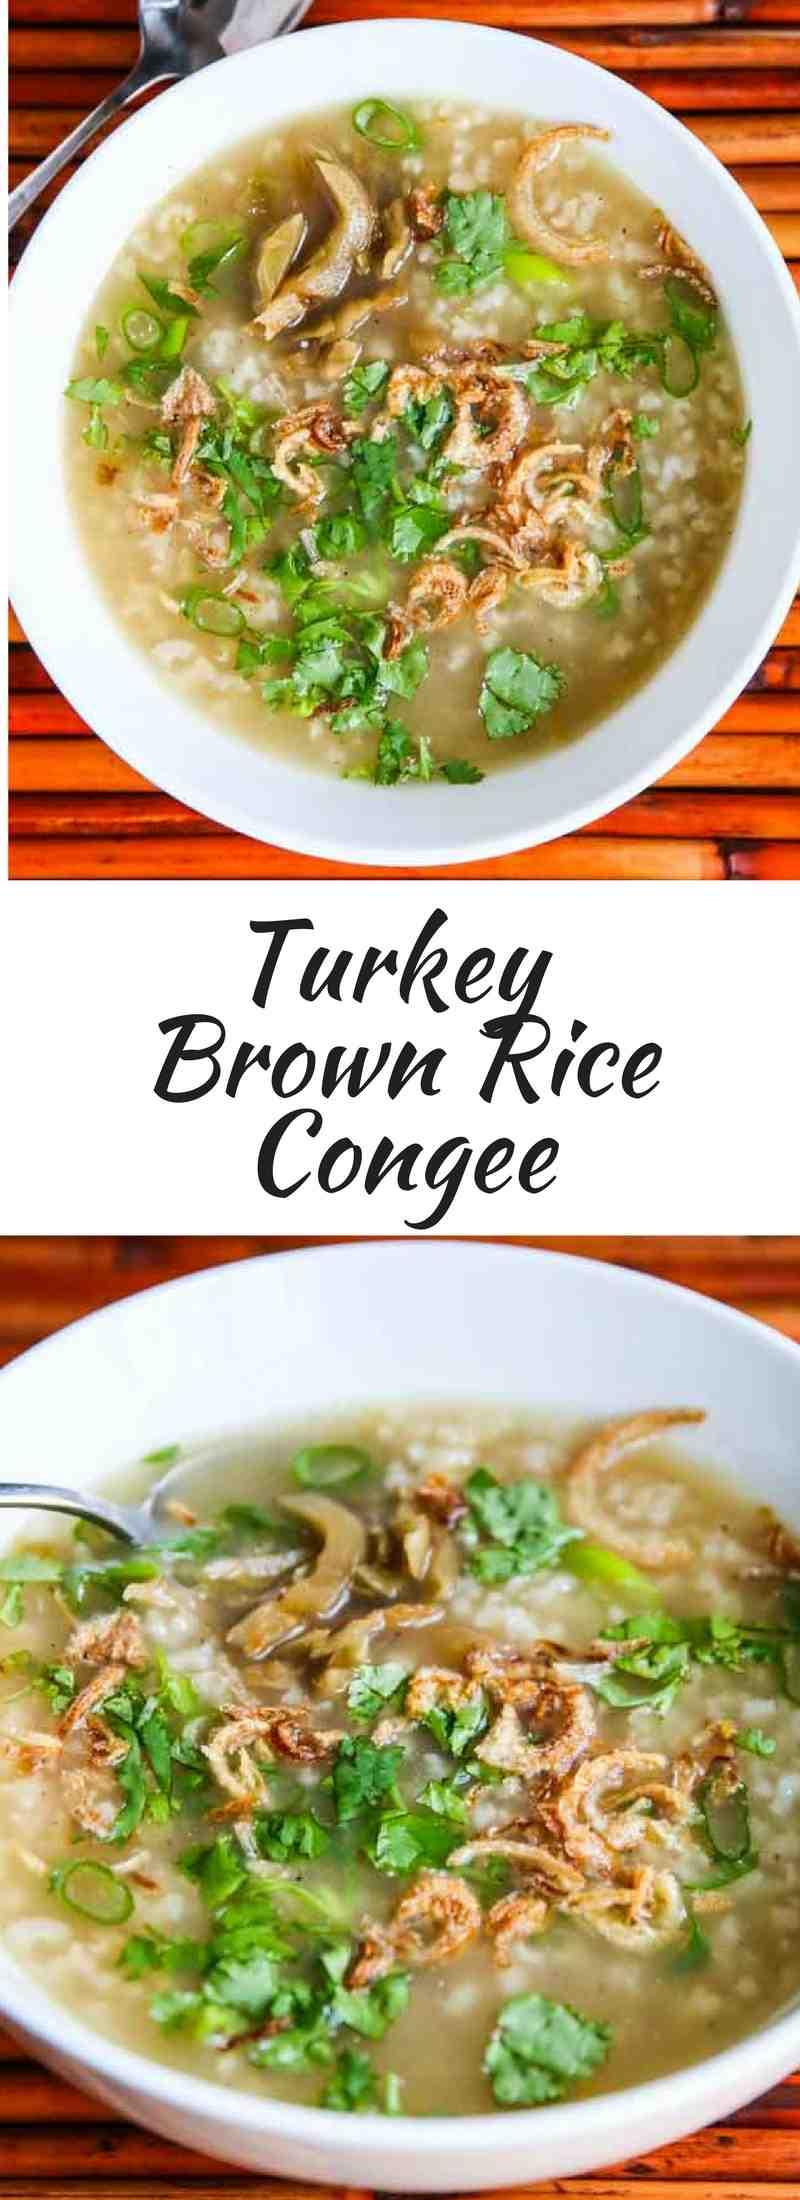 Turkey Brown Rice Congee - this savory breakfast porridge is a great way to use leftover turkey bones.